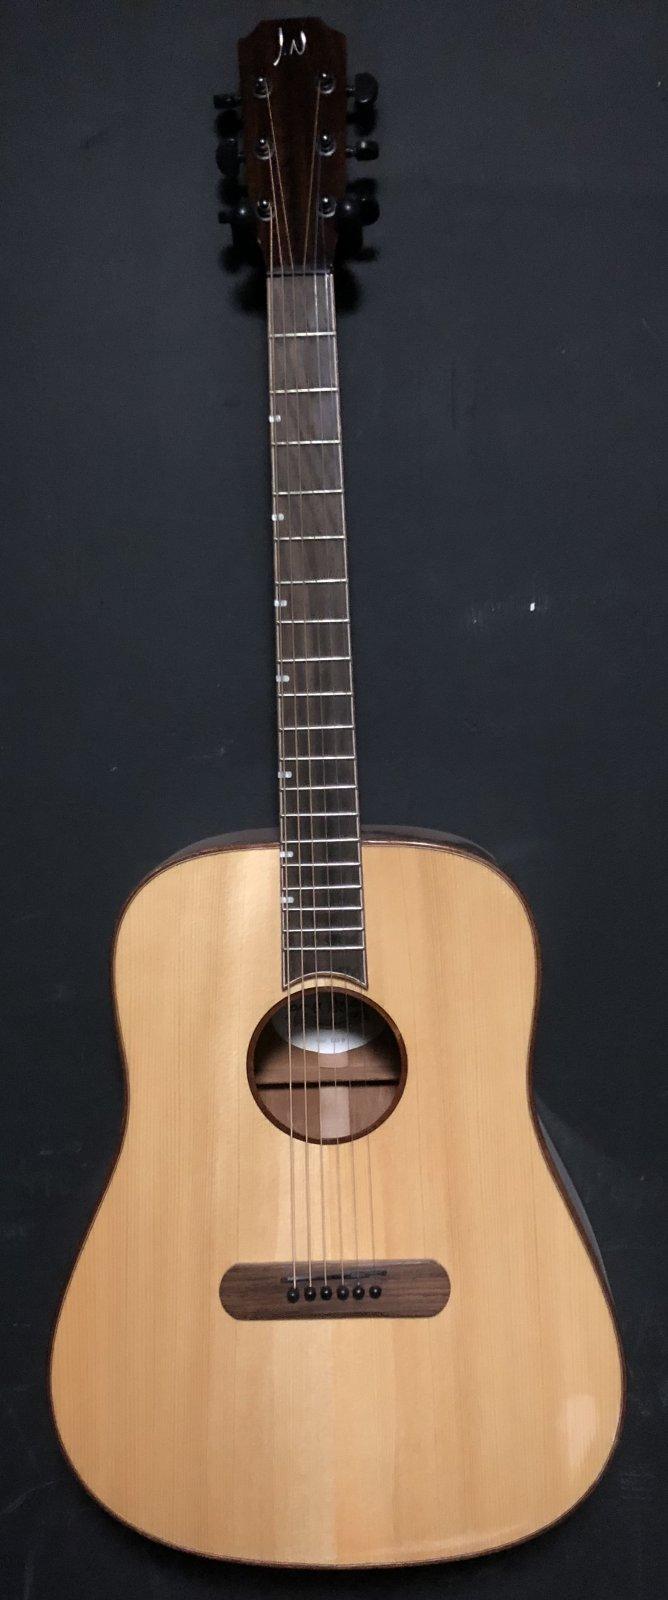 James Neligan LIS-D Solid Top Acoustic